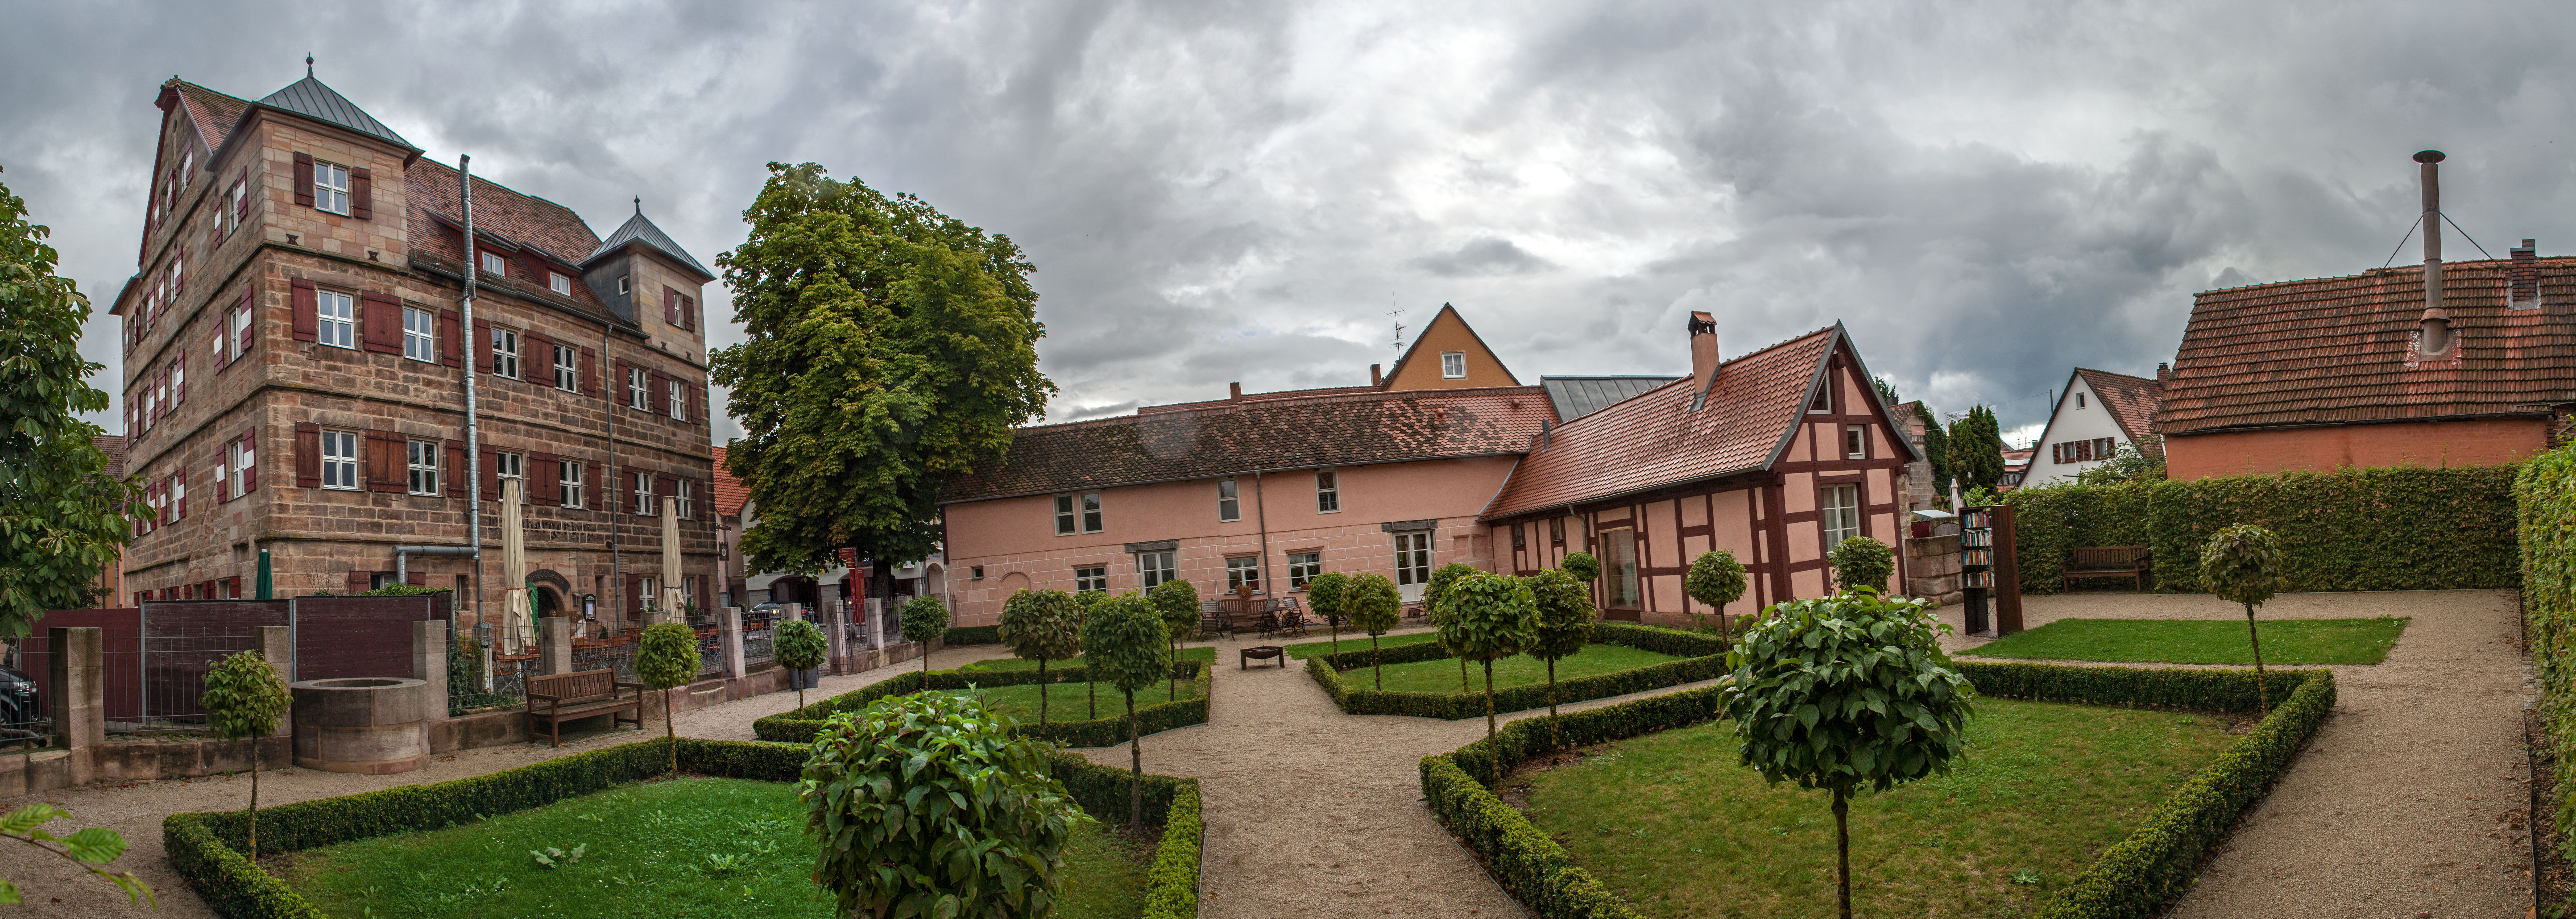 Tucherschloss Nürnberg